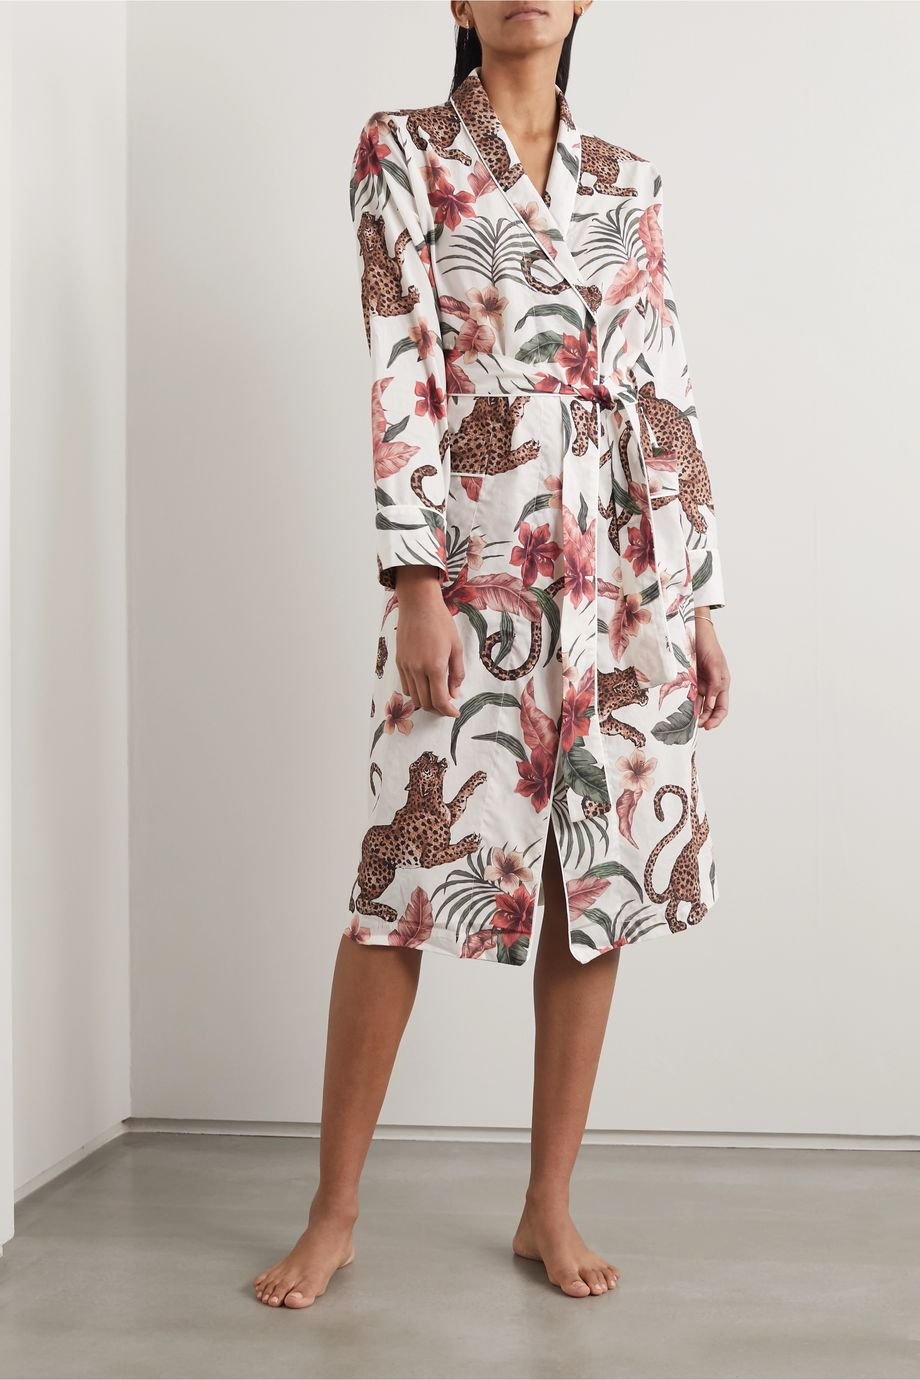 Desmond & Dempsey Soleia printed organic cotton-voile robe